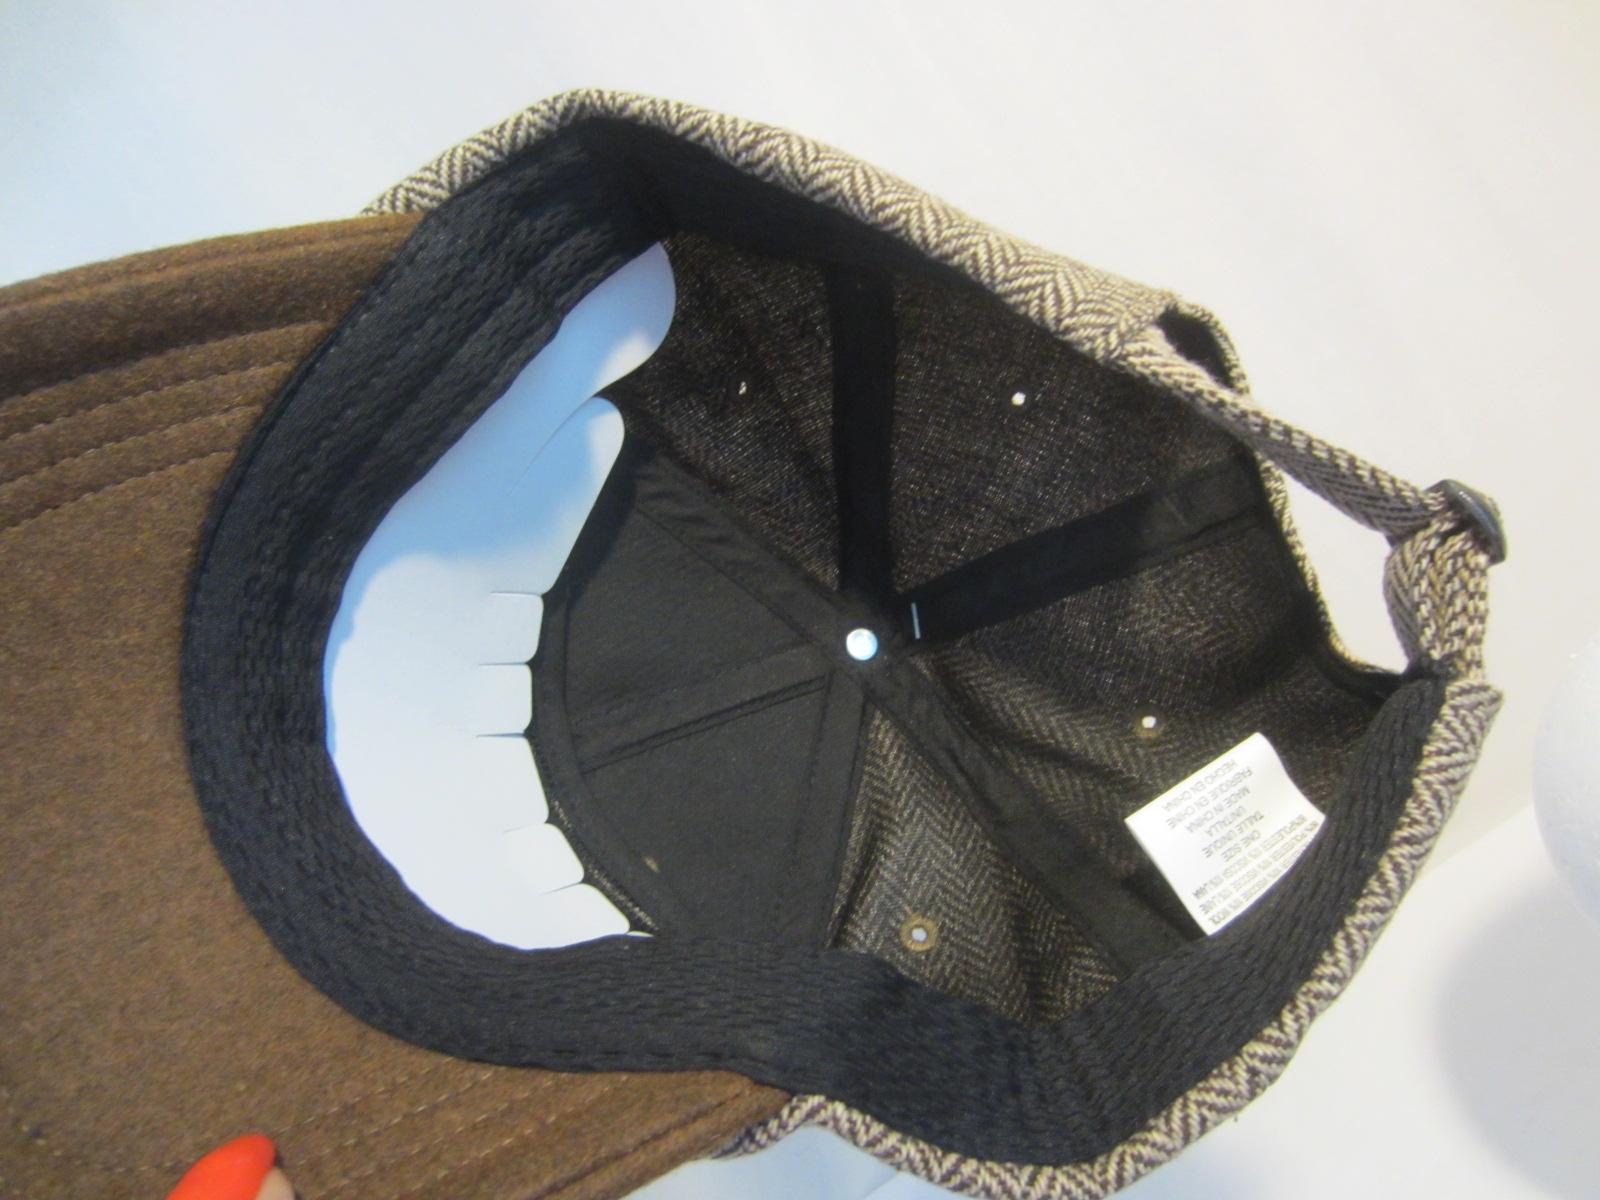 MERRELL herringbone finnic baseball cap hat NWT brown white $35